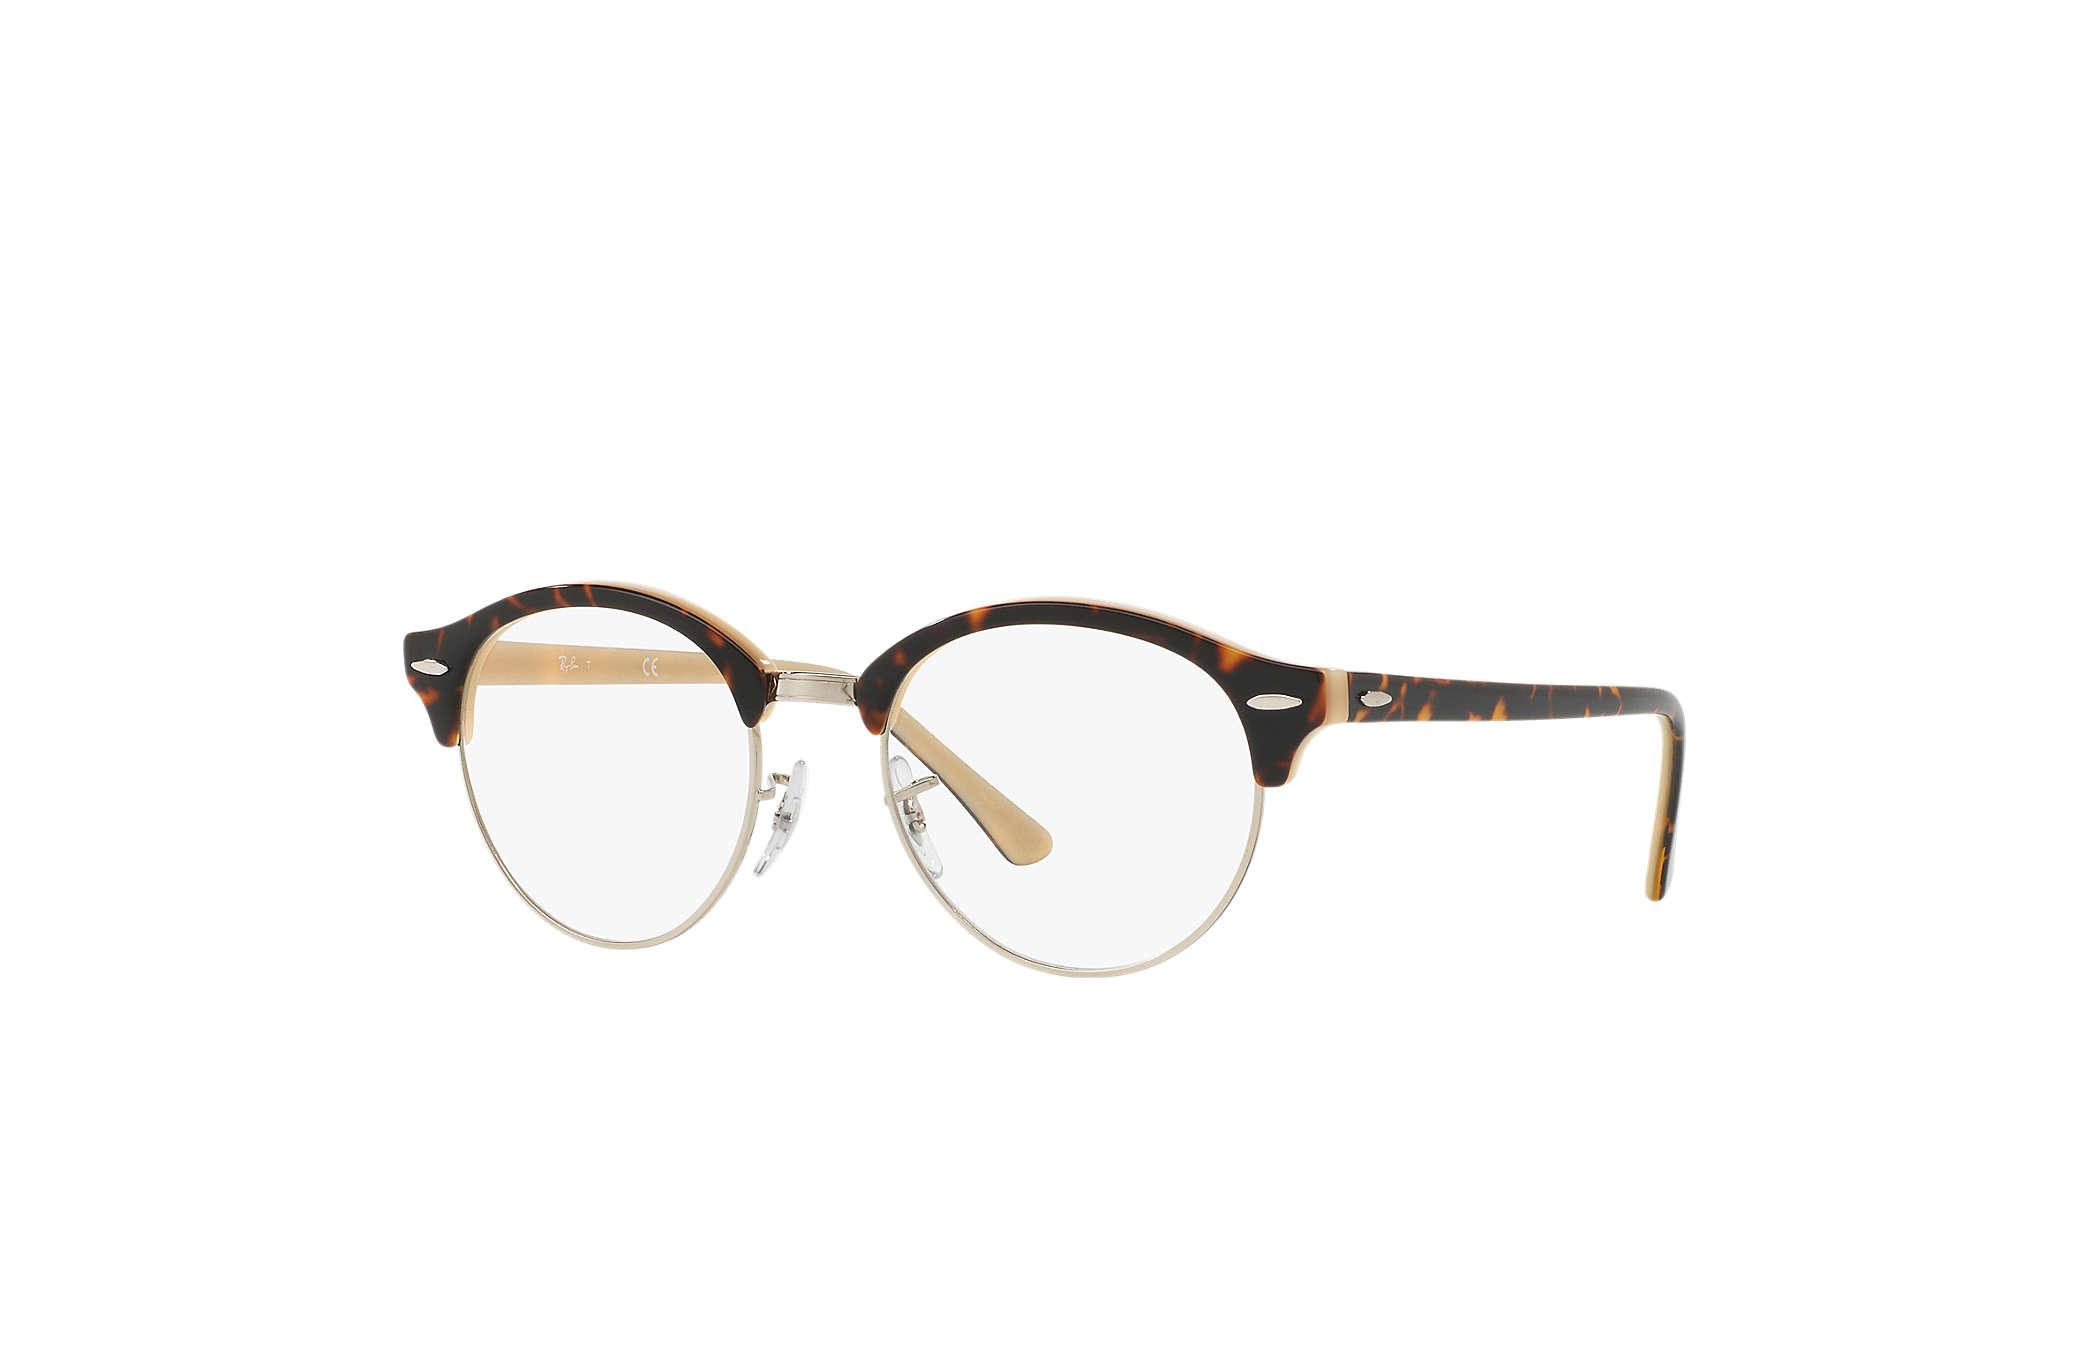 4773541ce28 Ray-Ban eyeglasses Clubround Optics RB4246V Tortoise - Acetate ...